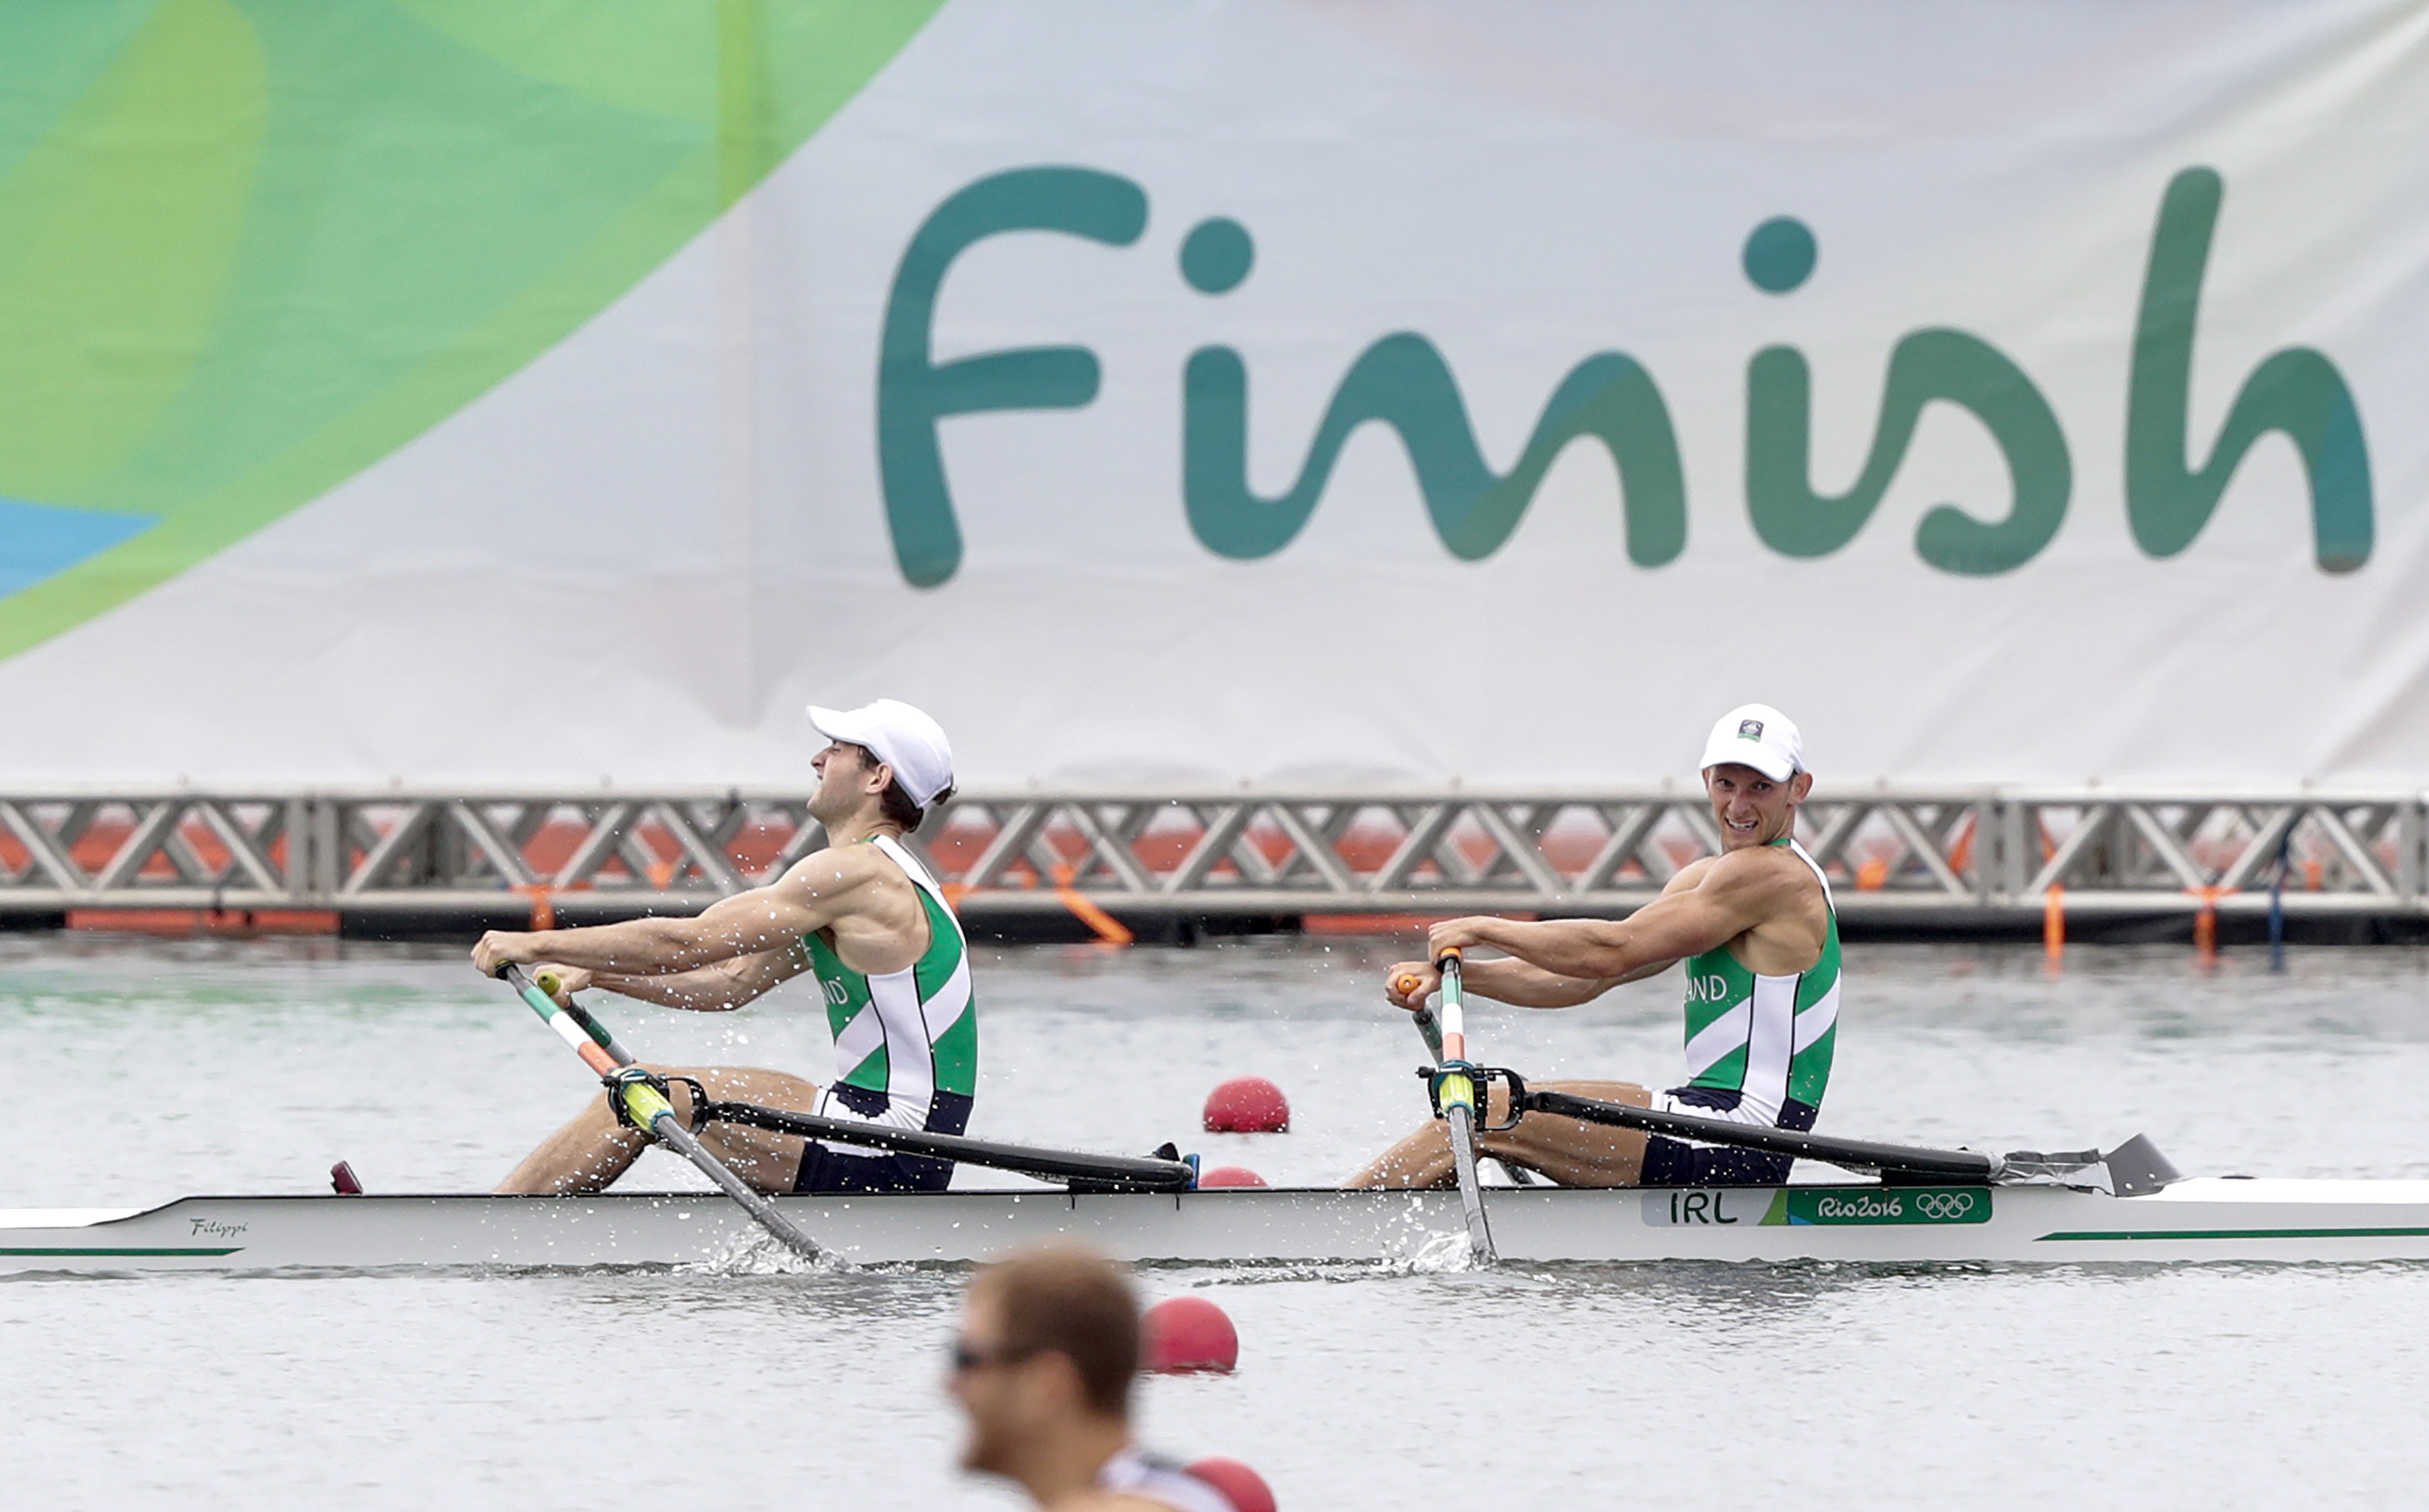 Rio 2016 Olympic Games Day 7, Rio de Janeiro, Brazil 12/8/2016 Rowing - Men's Lightweight Double Sculls Final Ireland's Gary and Paul O'Donovan cross the line to win silver Mandatory Credit ©INPHO/Morgan Treacy